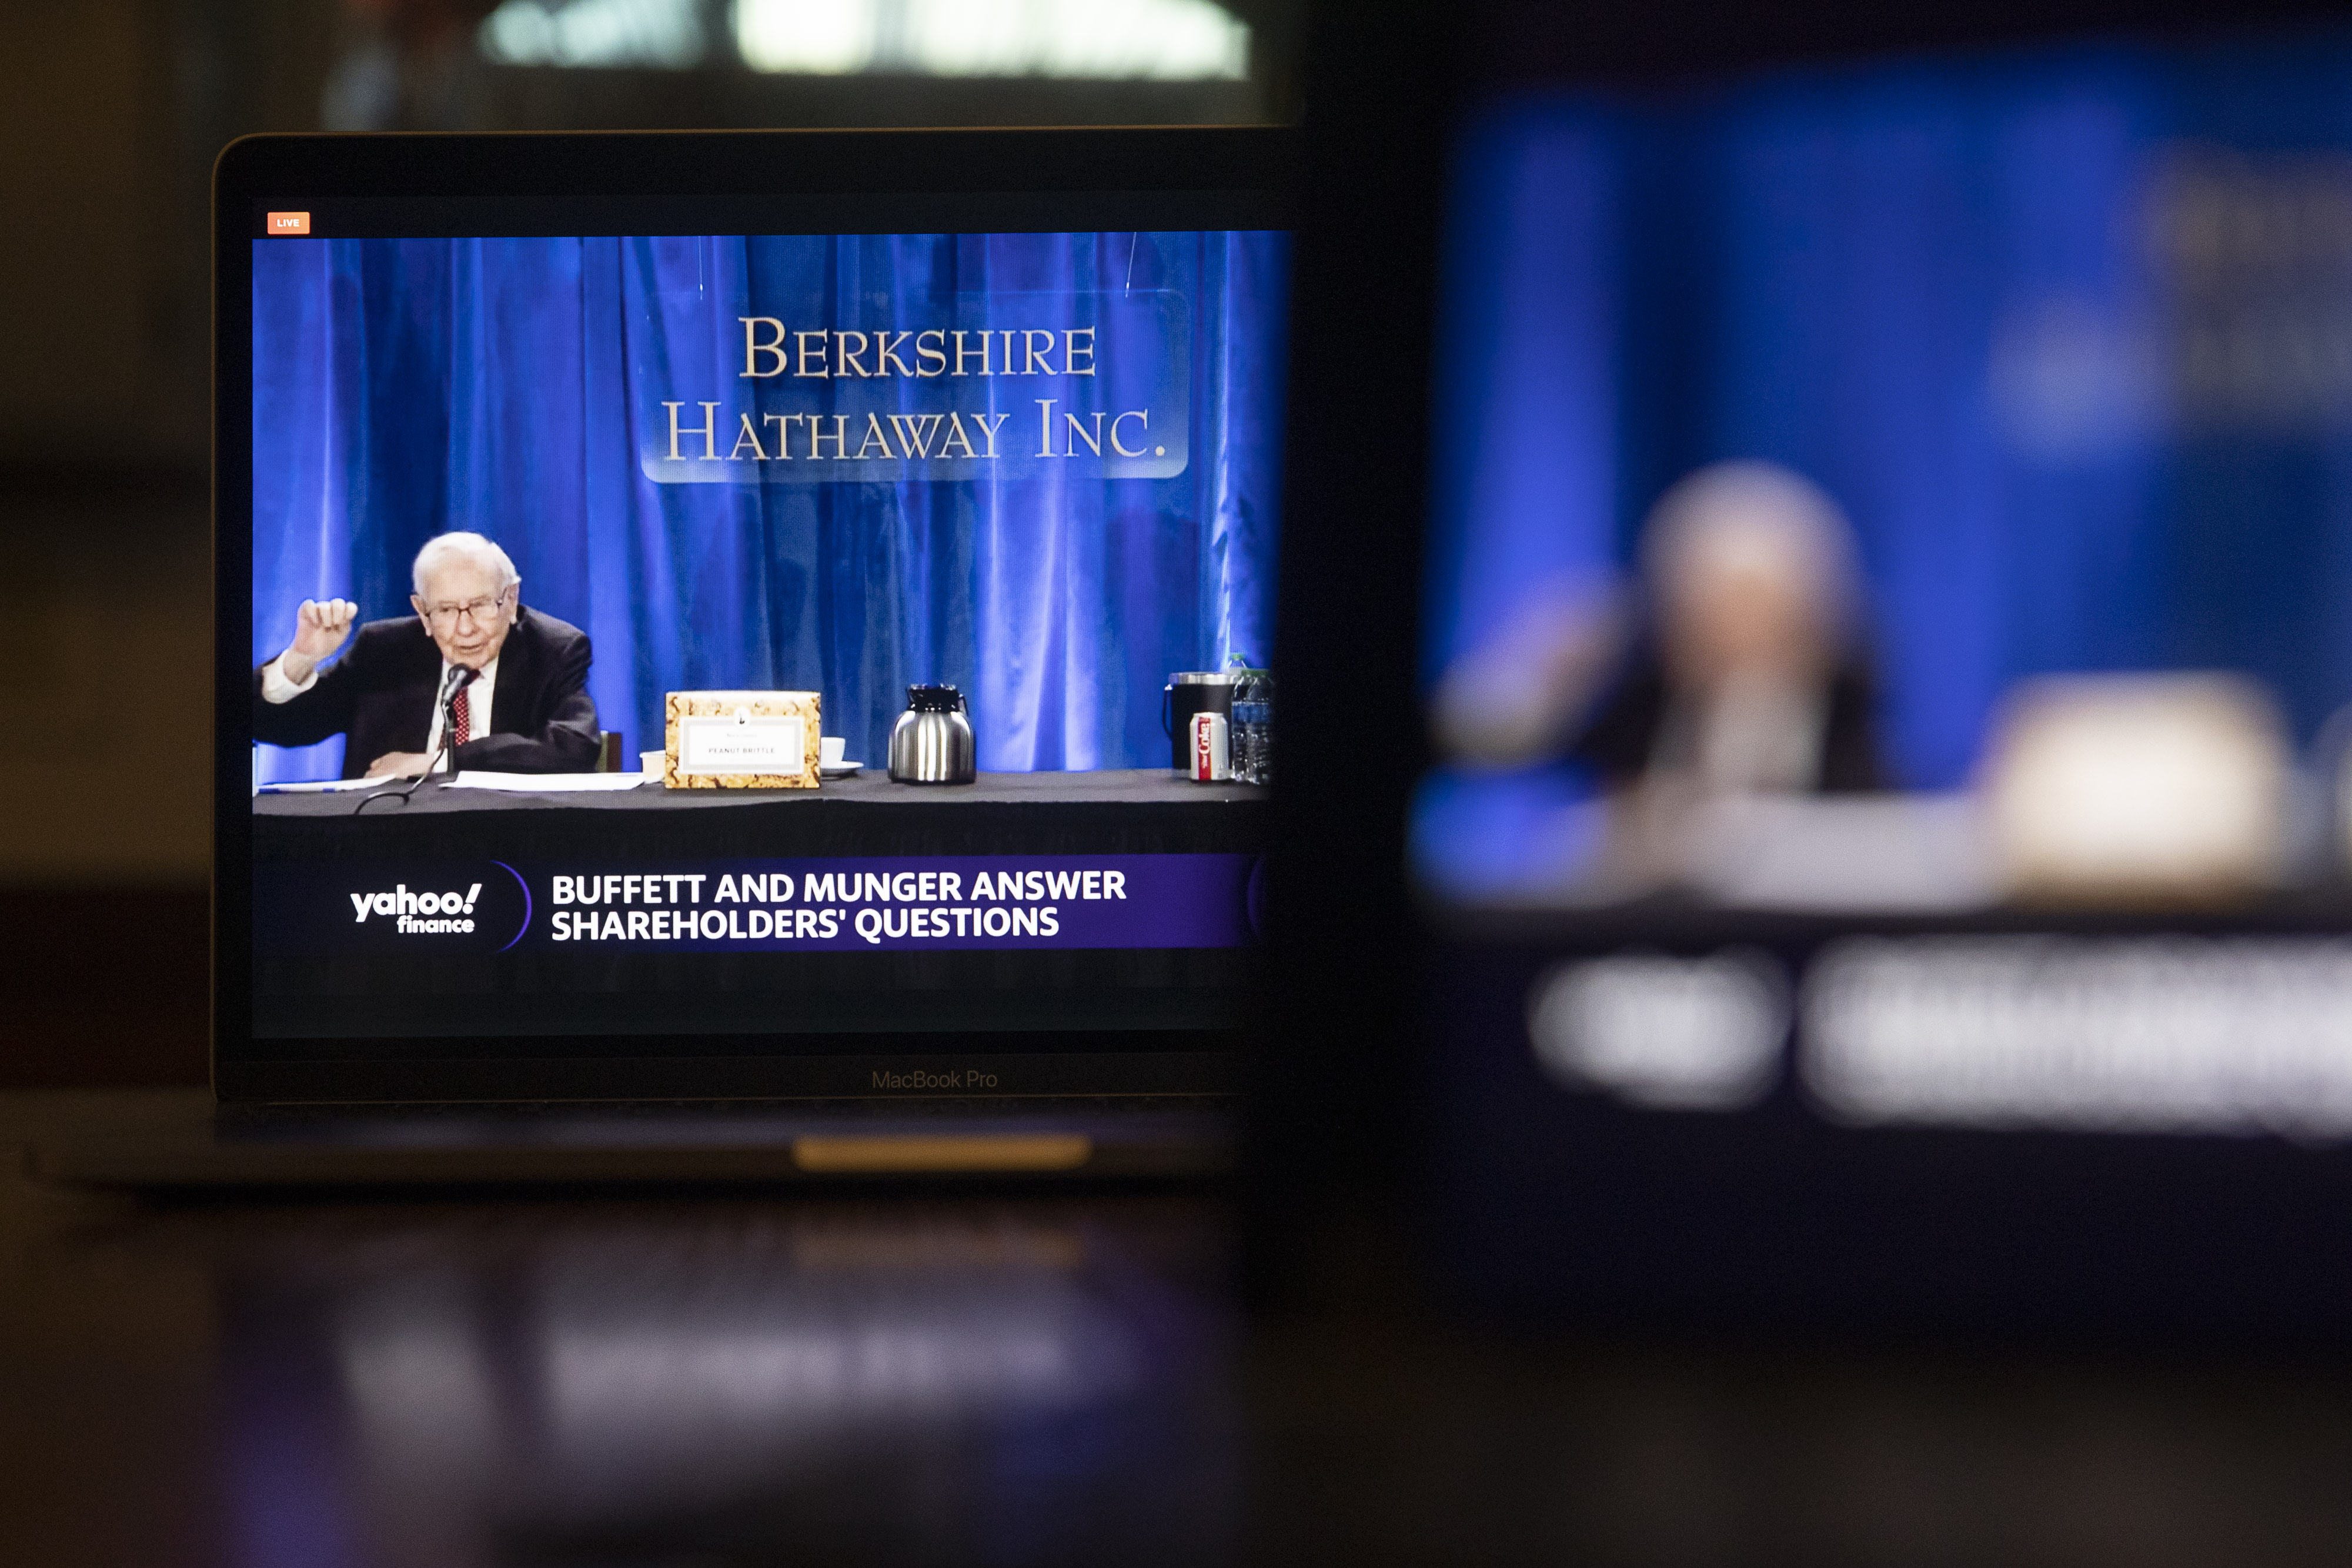 Ce crede Warren Buffett despre Bitcoin și Blockchain?